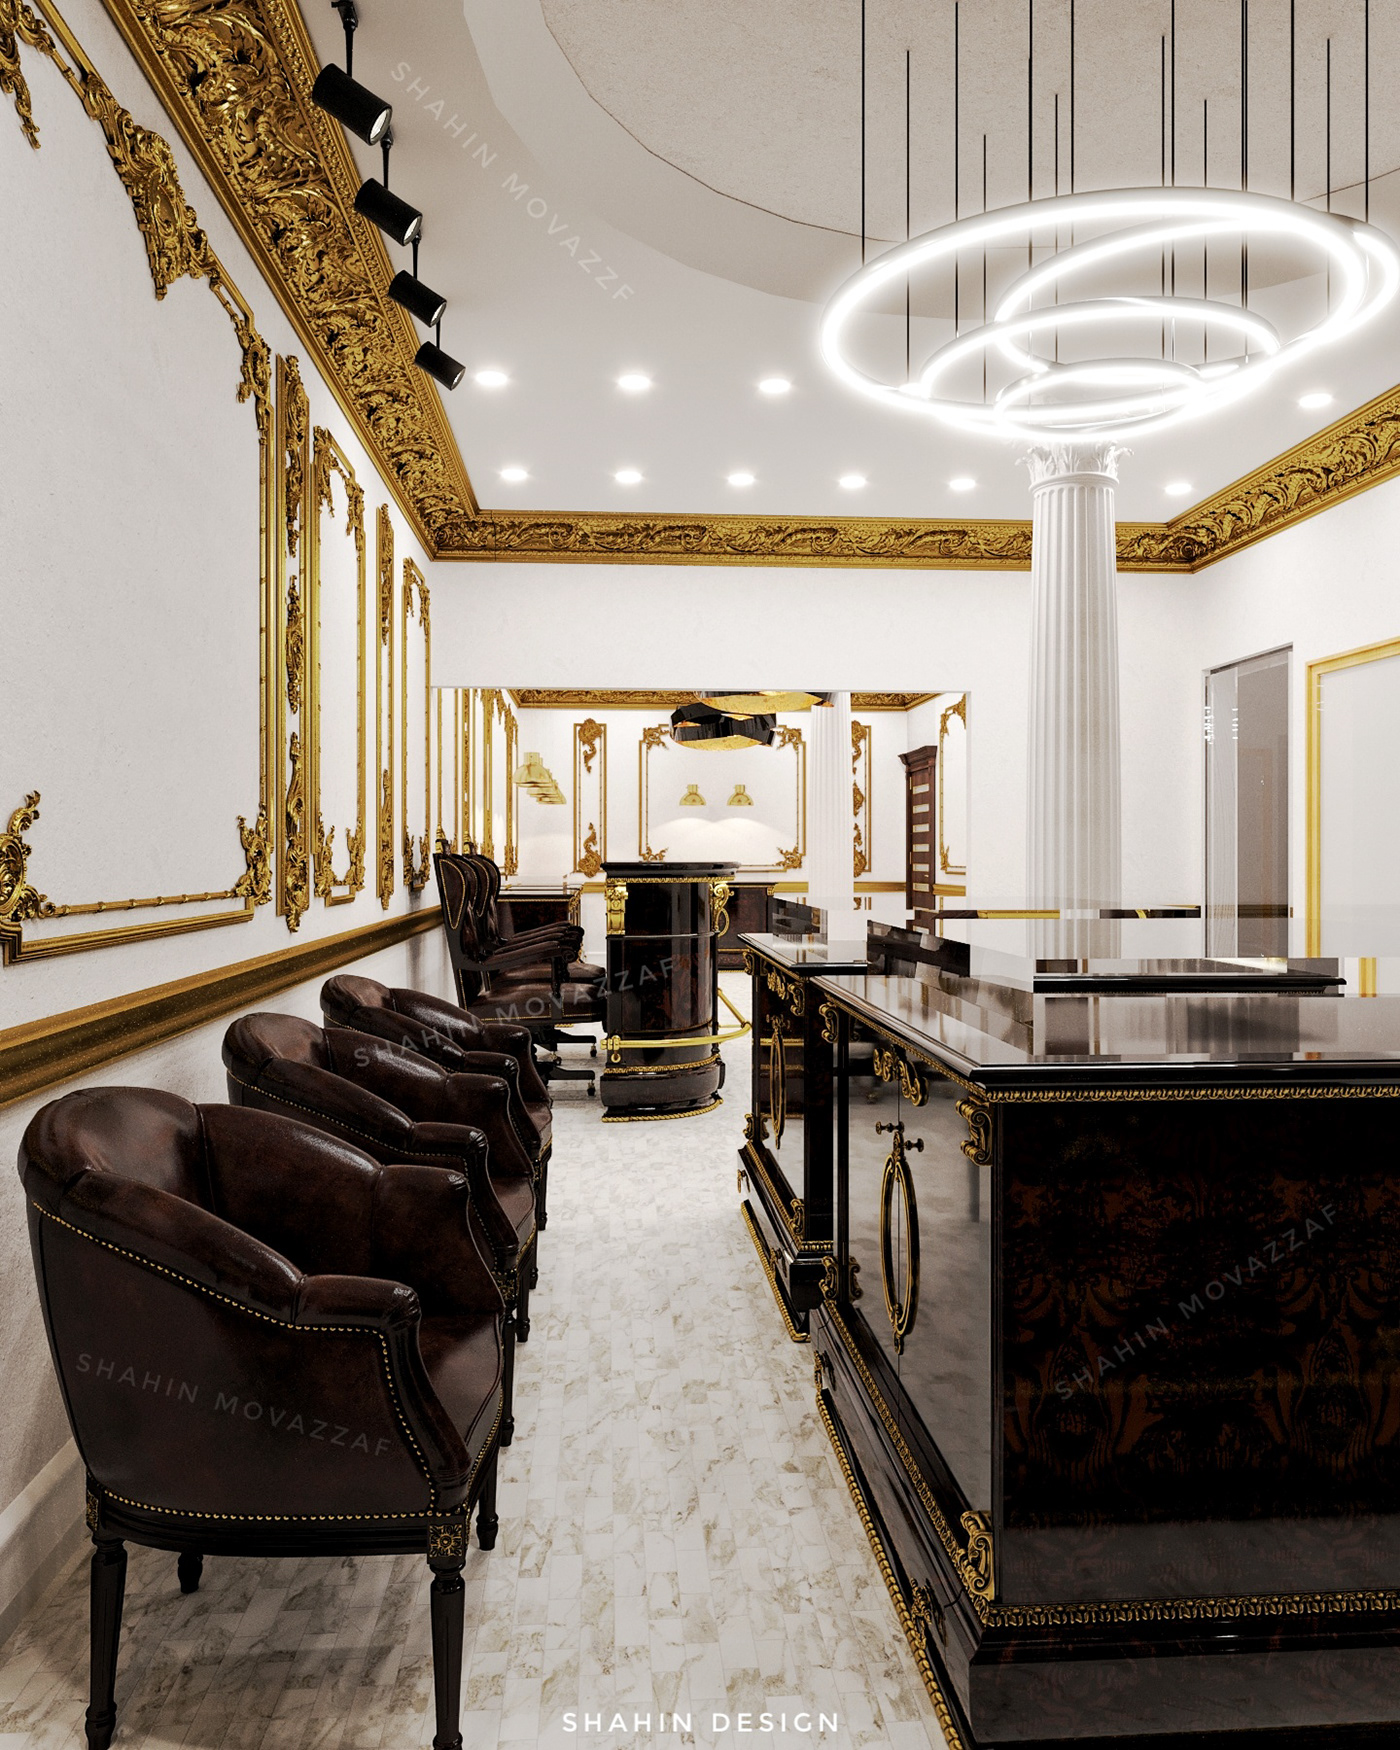 archviz CGI classic interior design corona render  interior design  Interior Visualization jewelry store